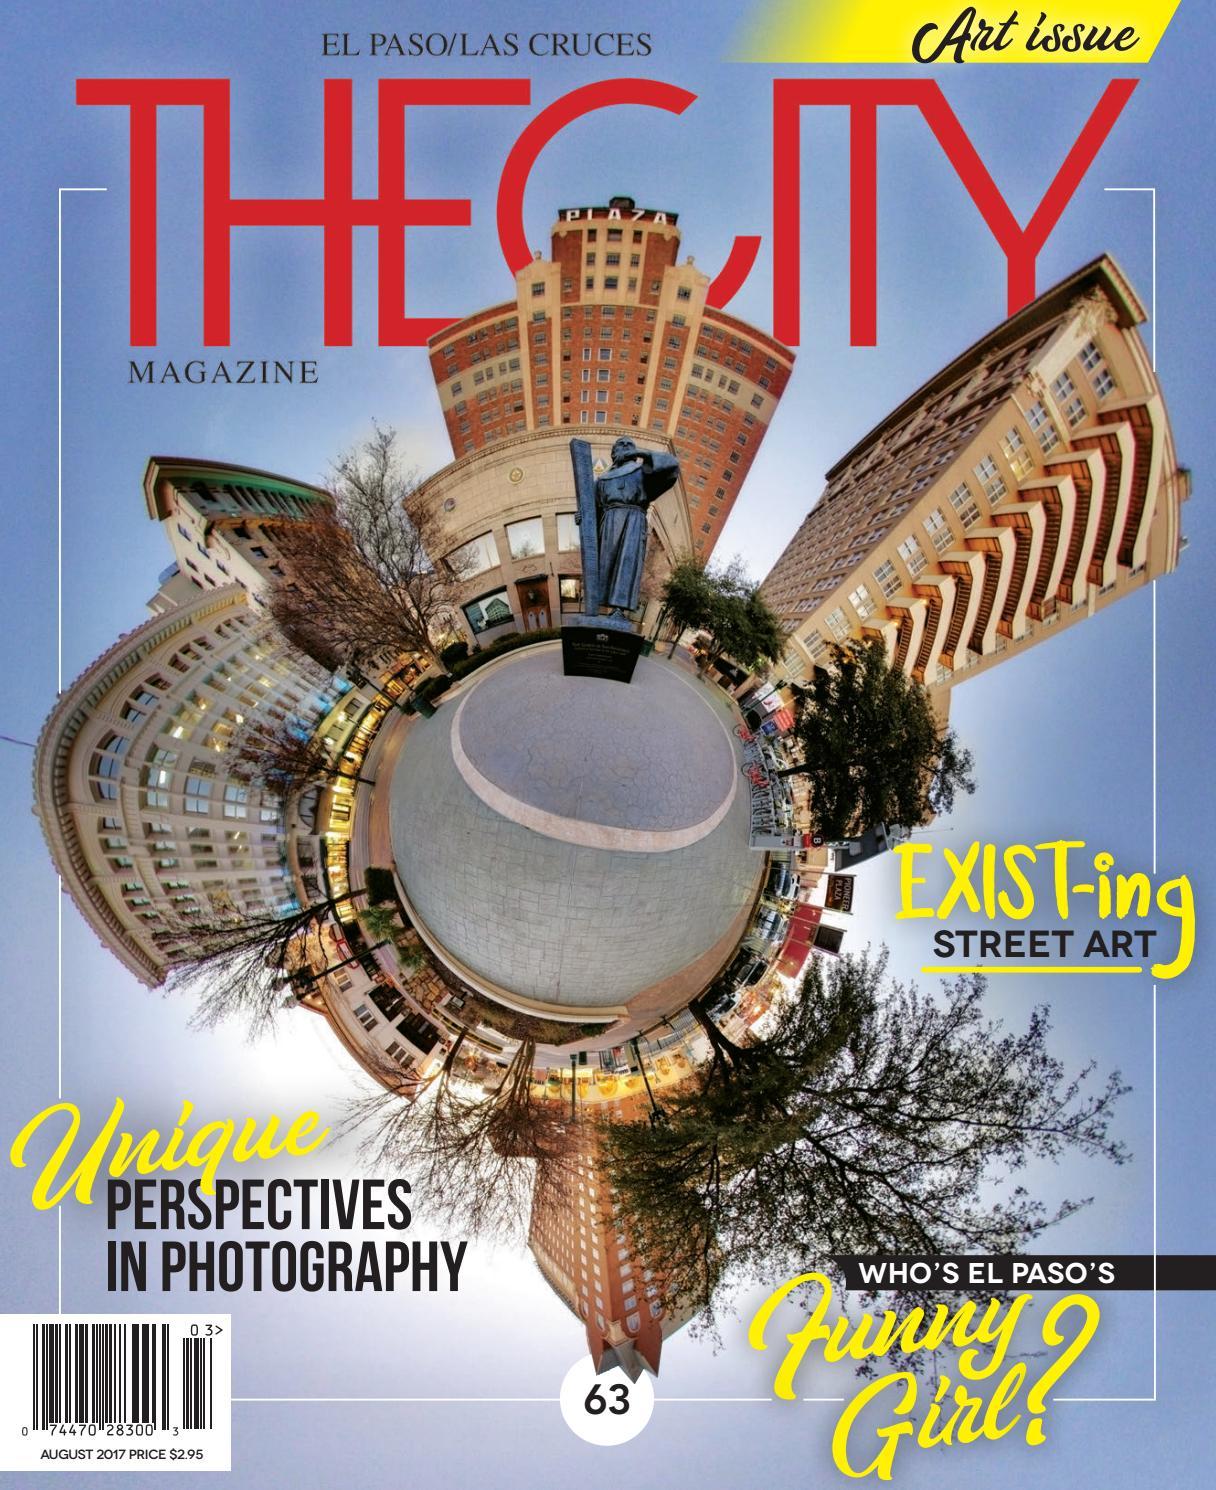 THECITY Magazine El Paso • August 2017 By THECITY Magazine